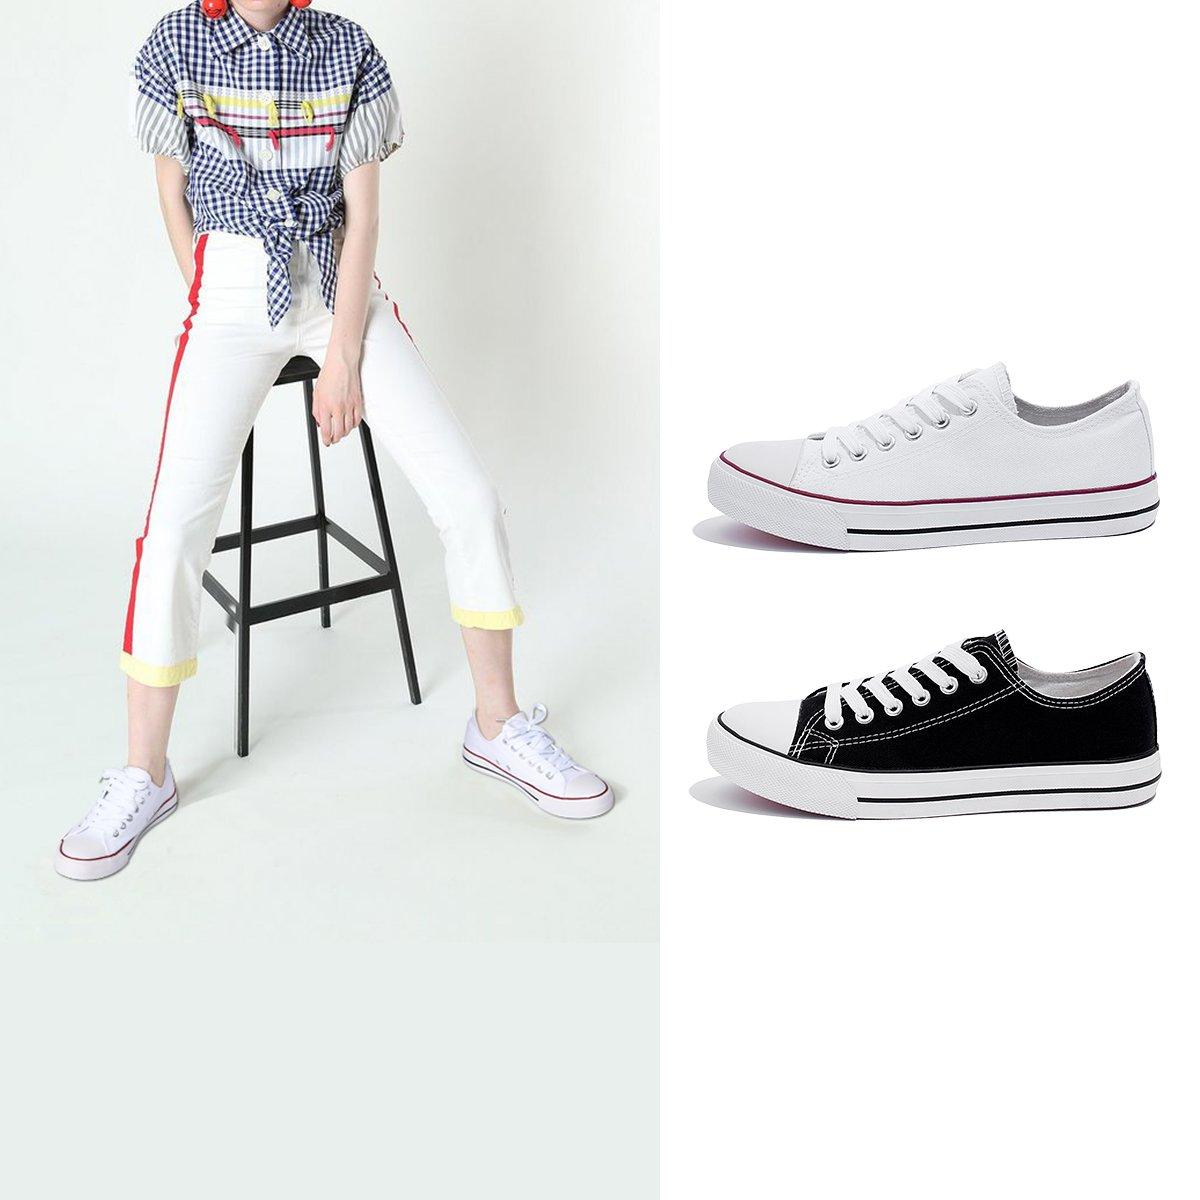 AOMAIS Womens Canvas Shoes Sneaker Low Top Lace up Fashion Walking Shoes (US7, white1) … by AOMAIS (Image #6)